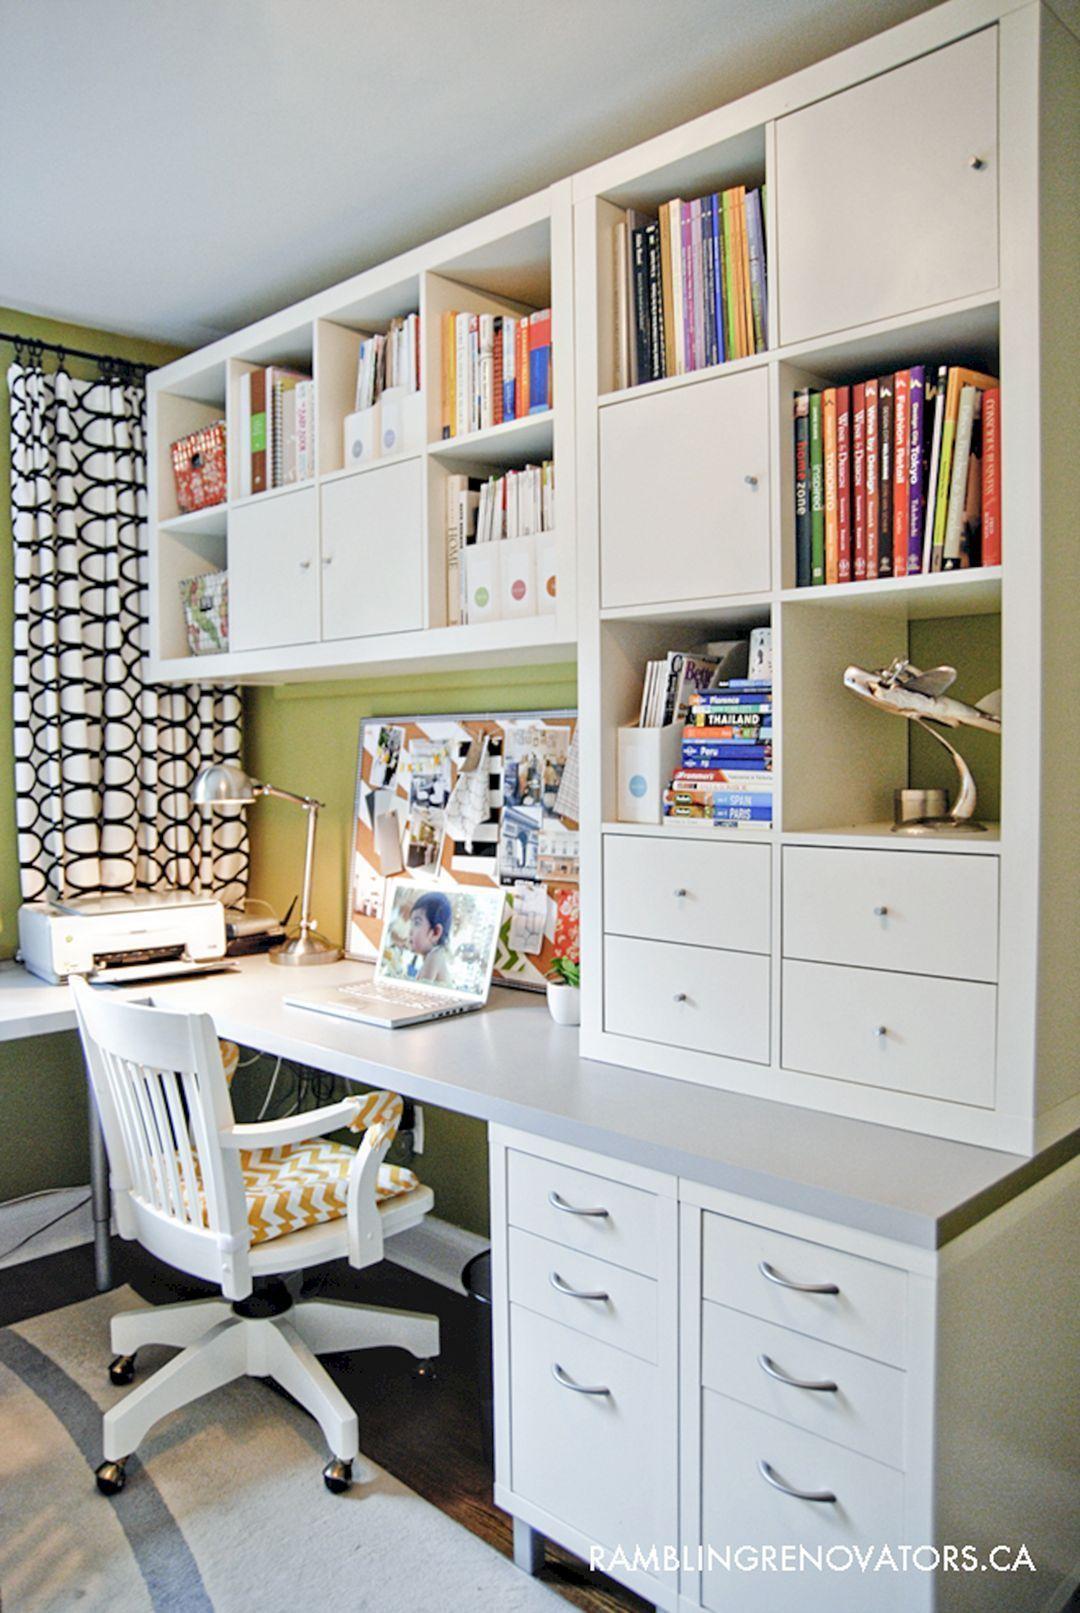 Small Study Room Design Ideas 4 Small Study Room Design Ideas 4